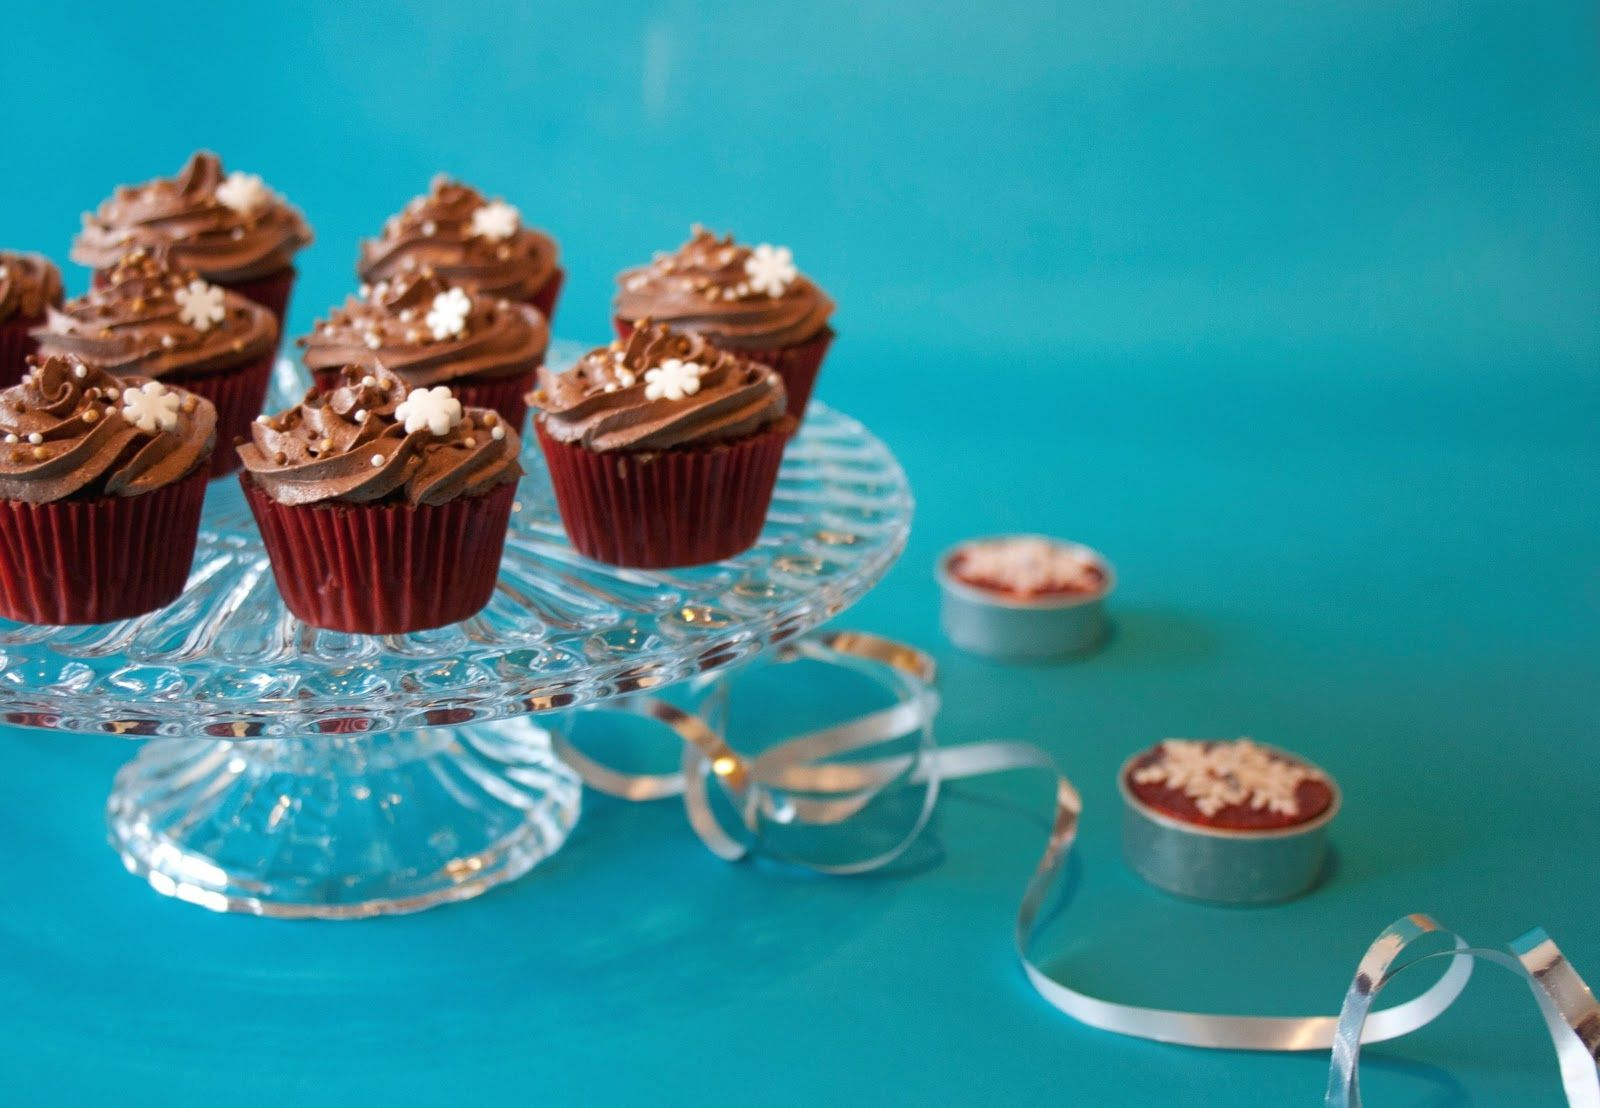 Painted By Cakes: Kuppikakut - Cupcakes